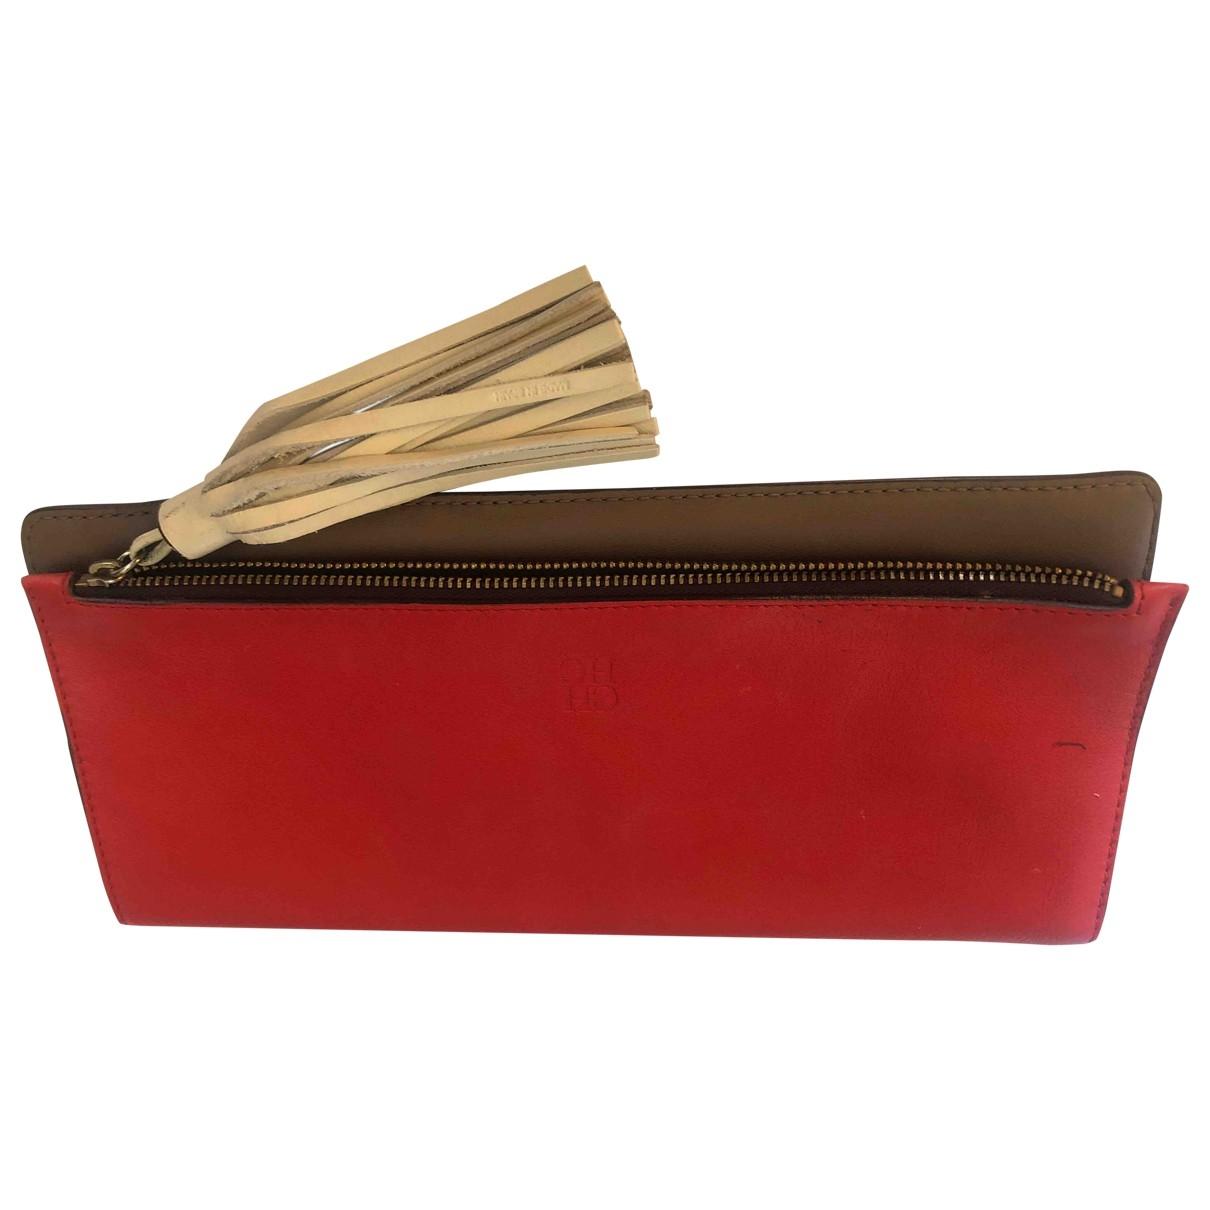 Carolina Herrera \N Multicolour Leather handbag for Women \N